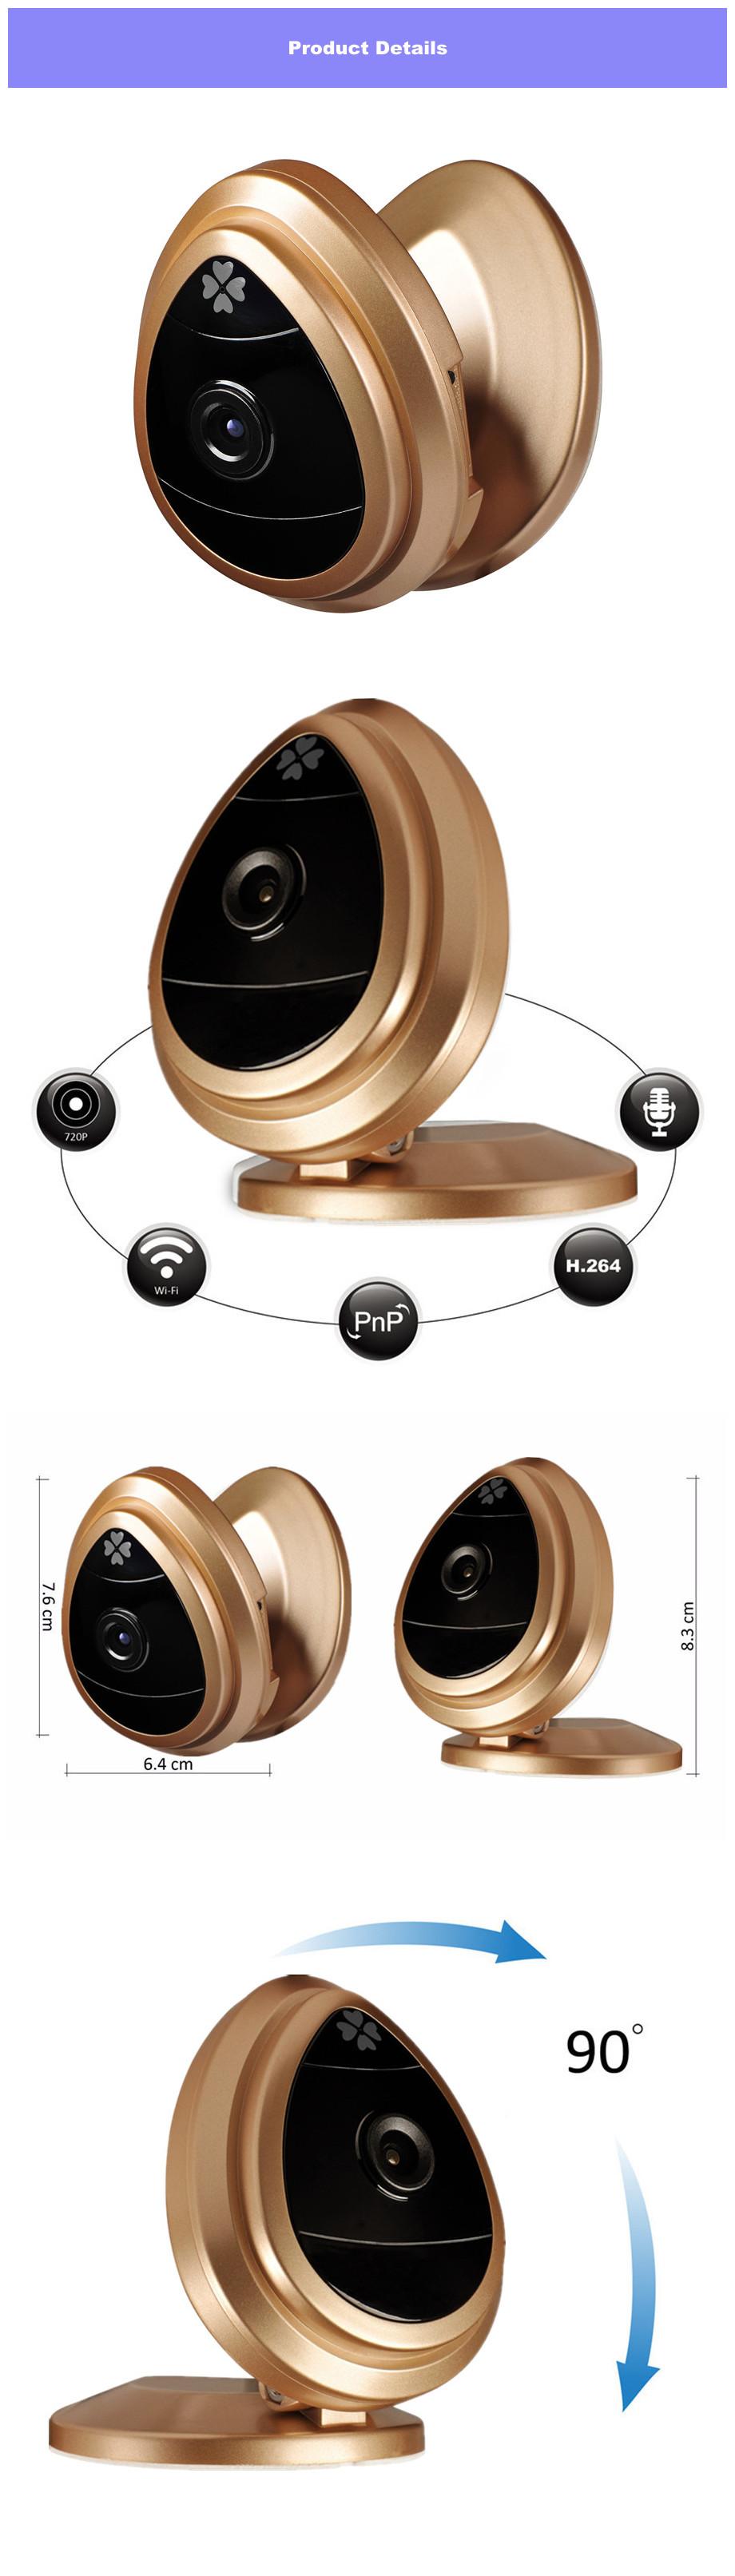 wifi ip camera (4)